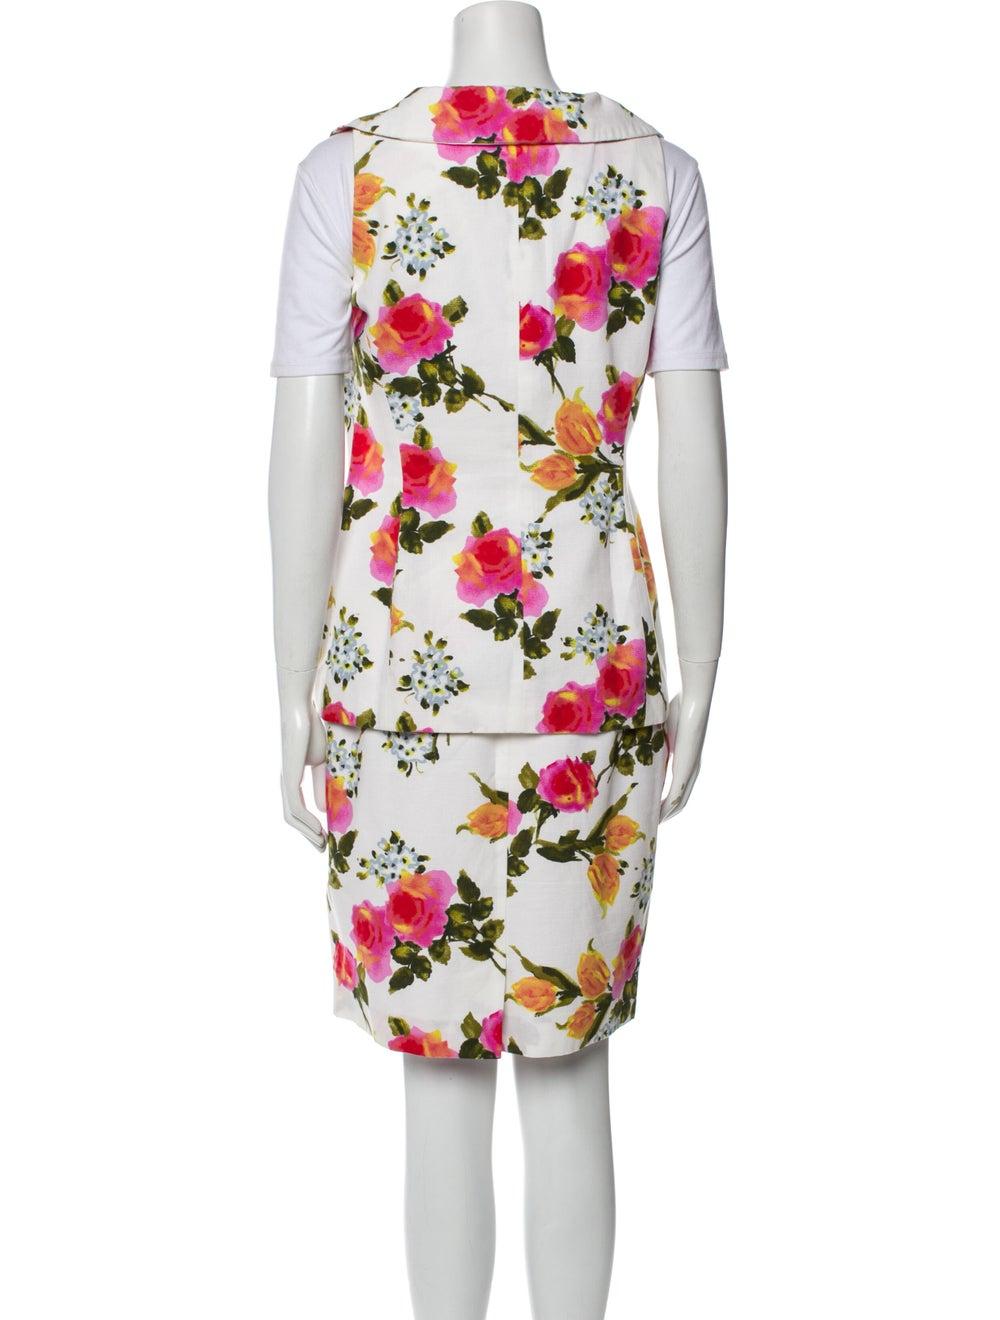 Christian Dior Vintage 1980's Skirt Set White - image 3